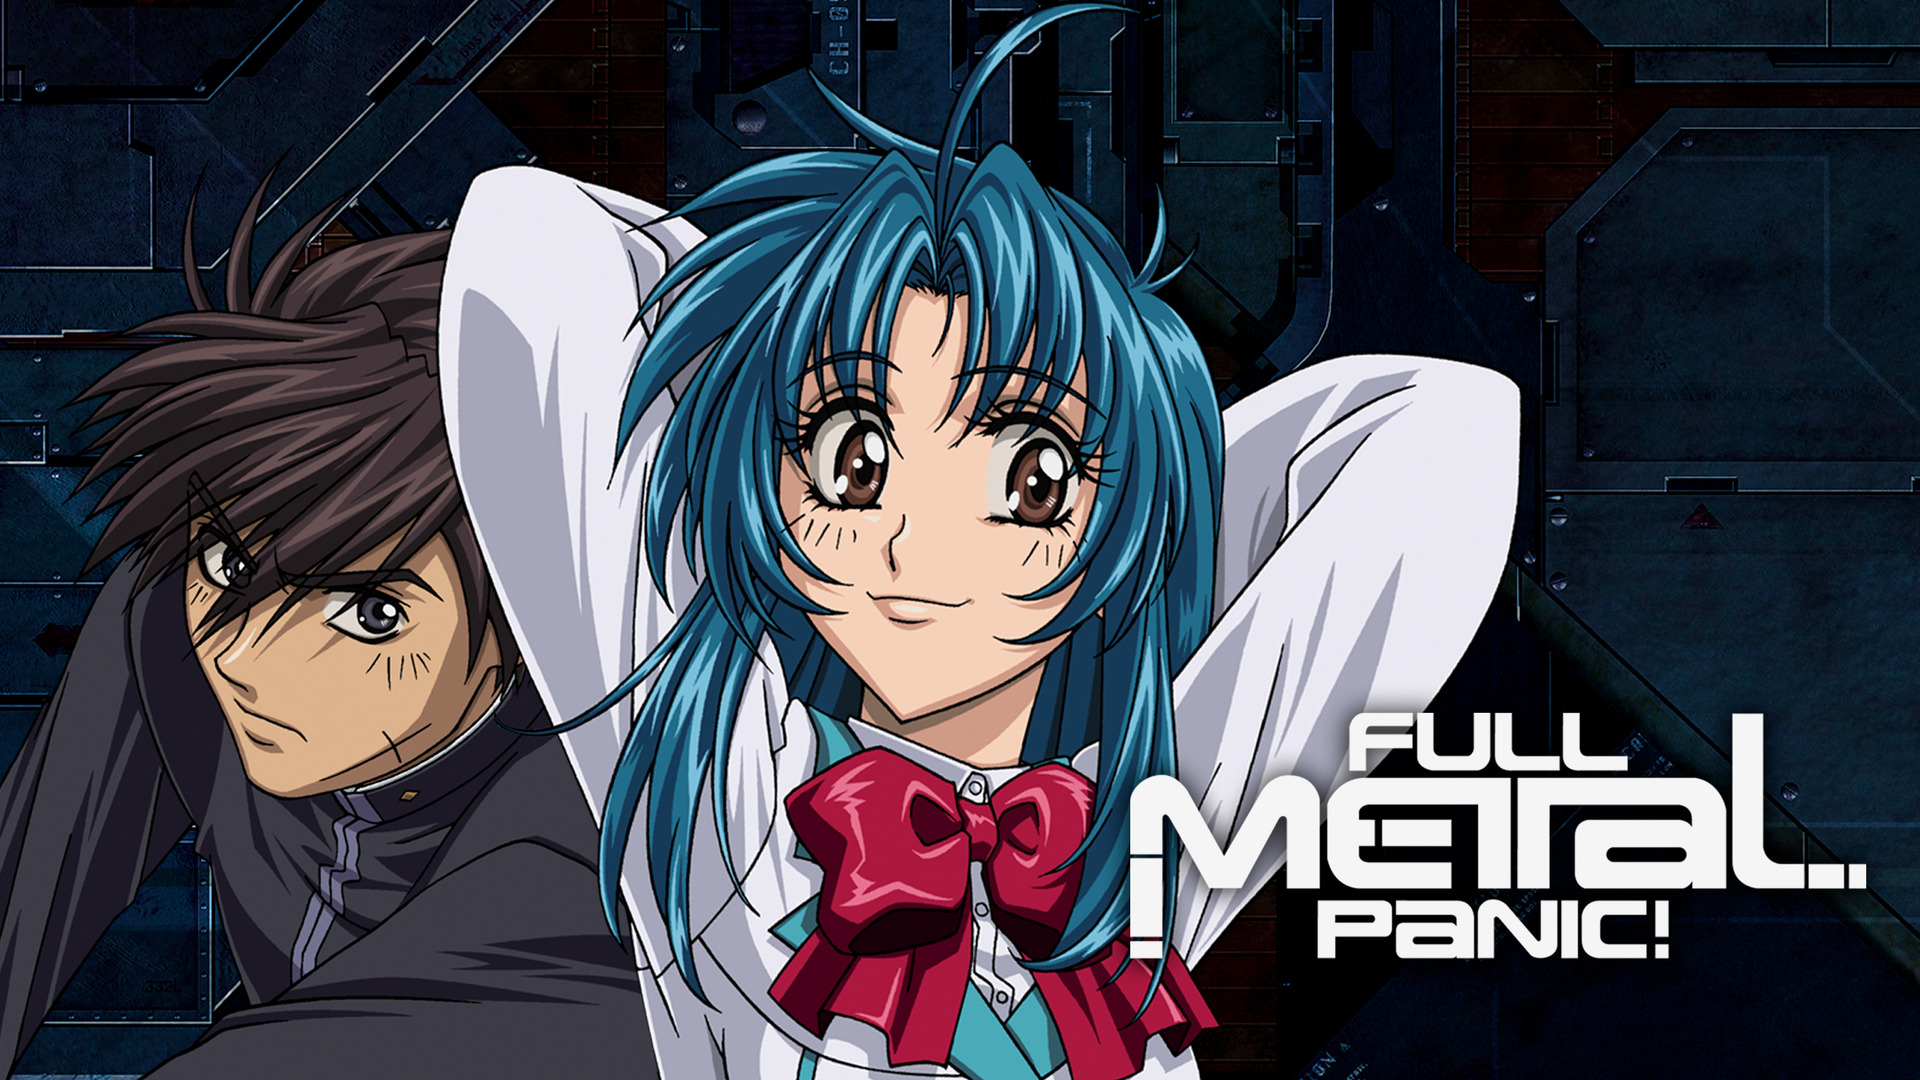 Anime Full Metal Panic!